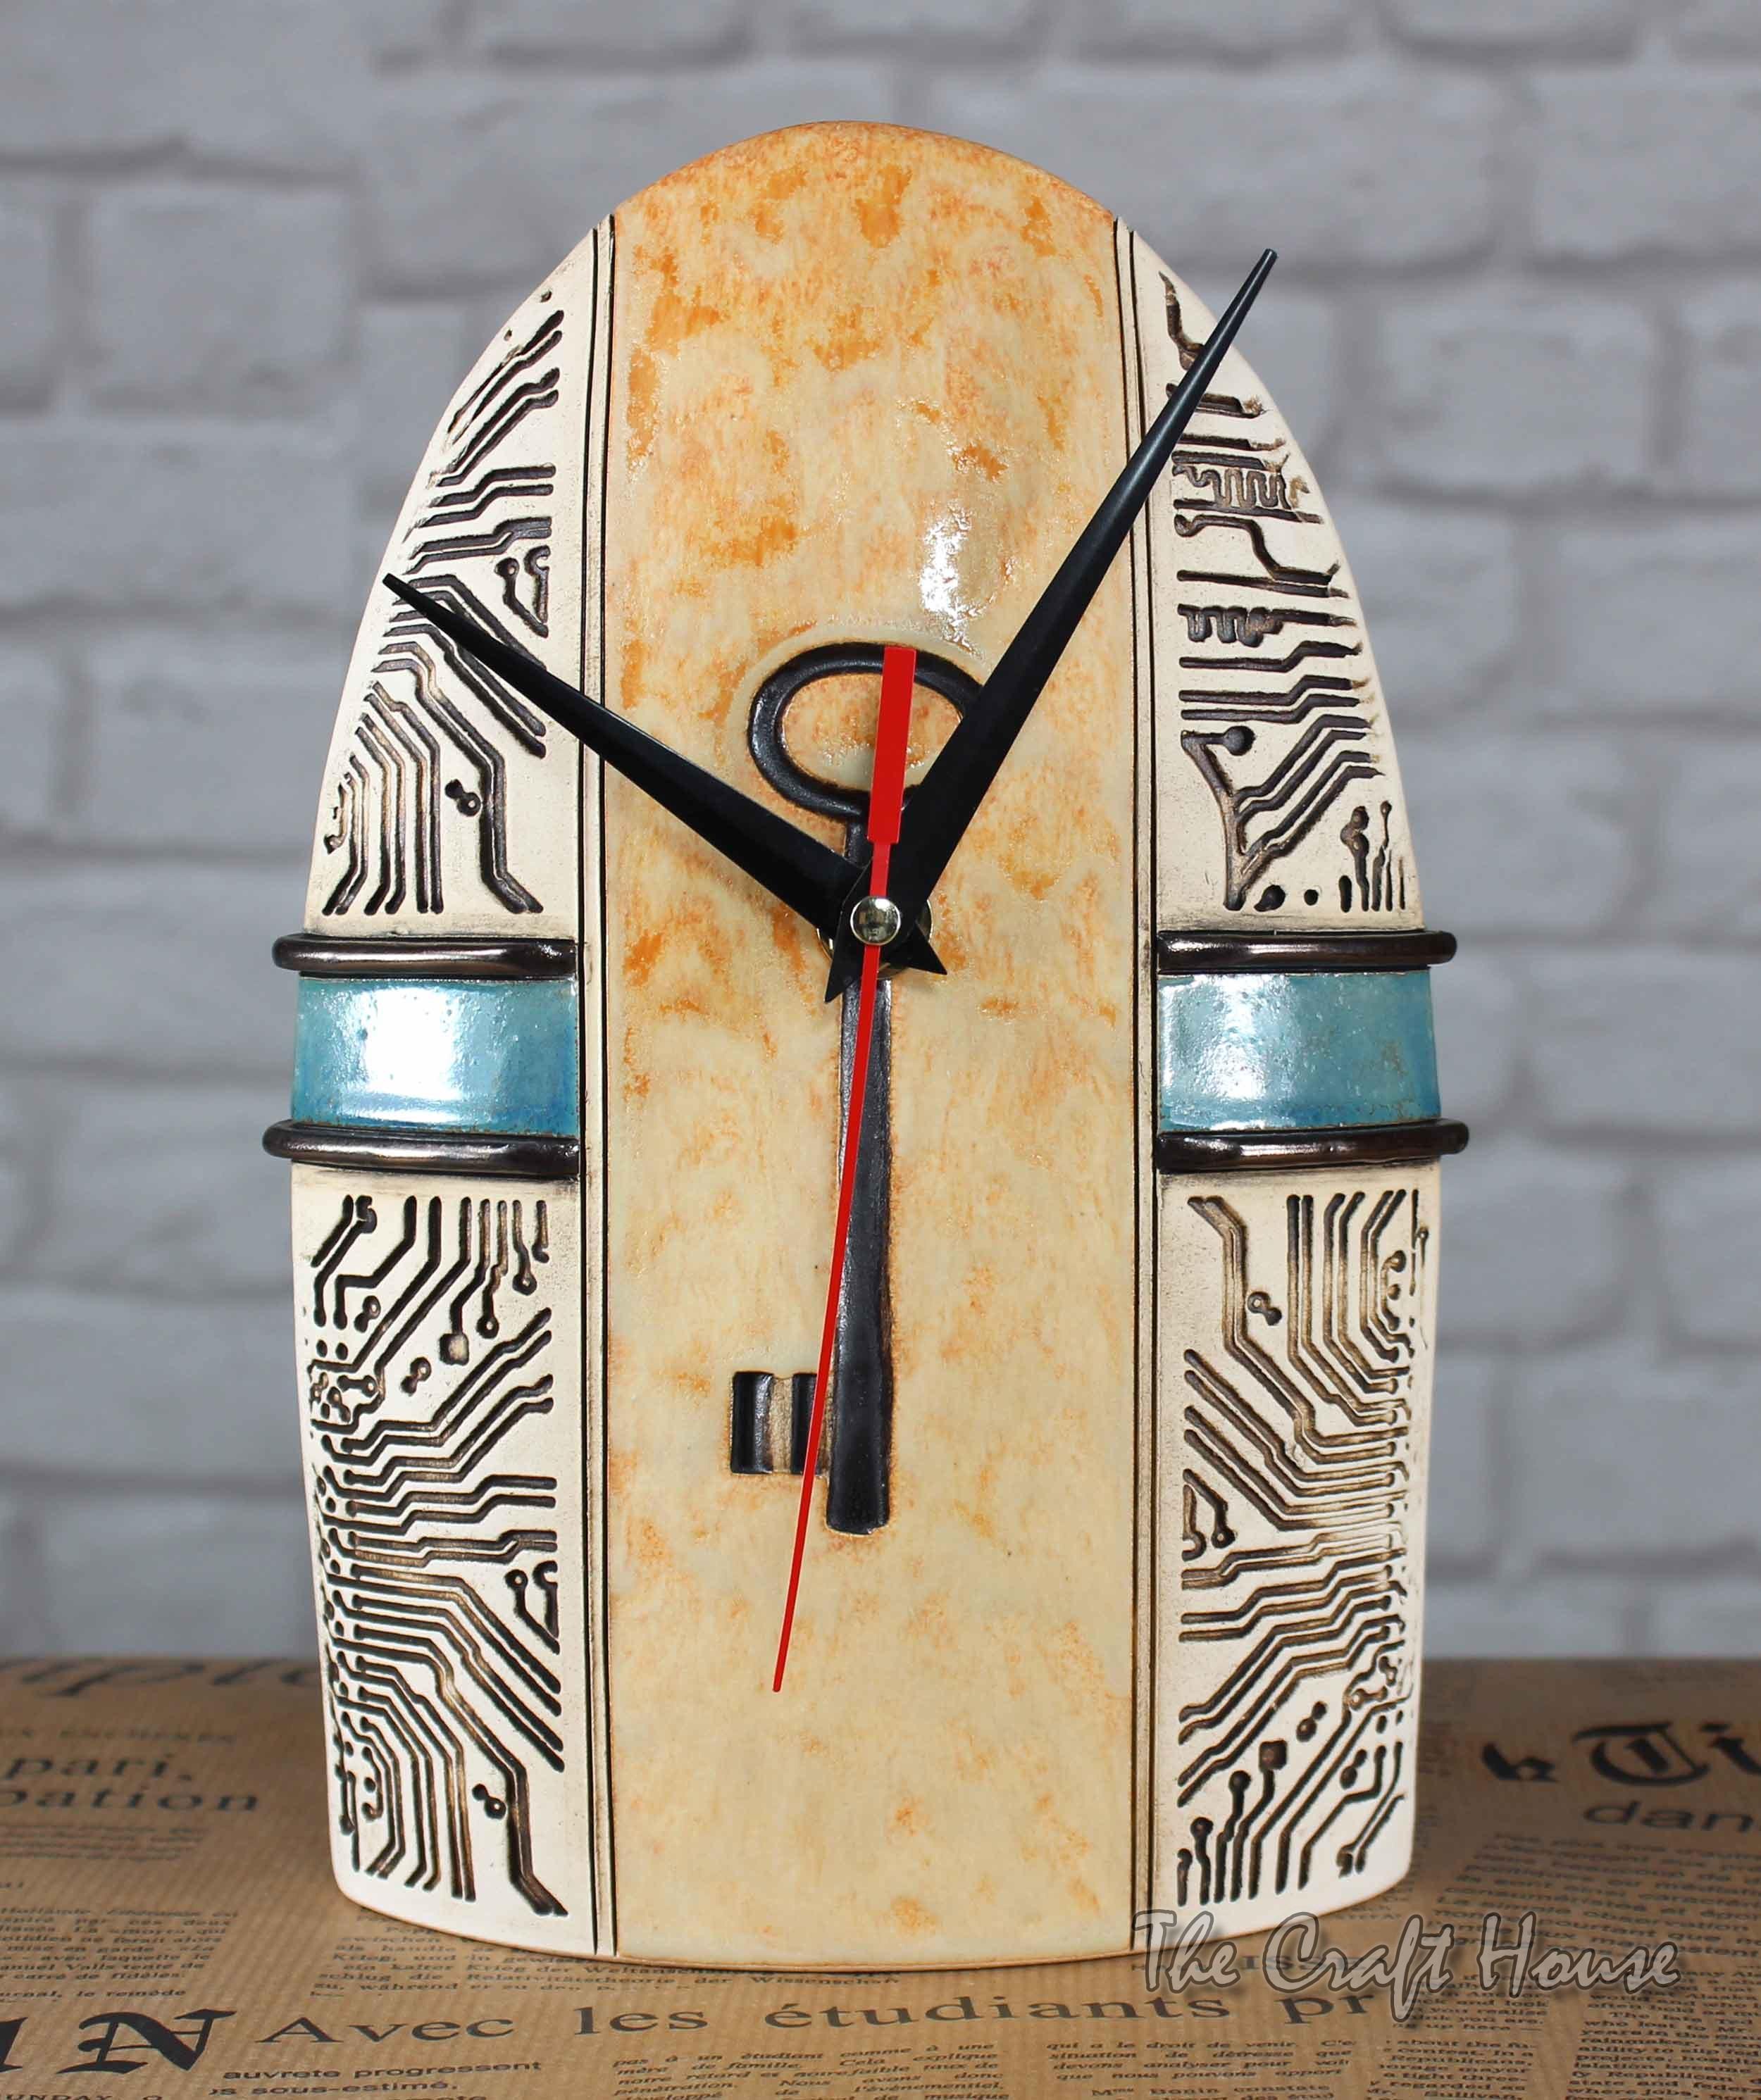 Ceramic clock with key decoration